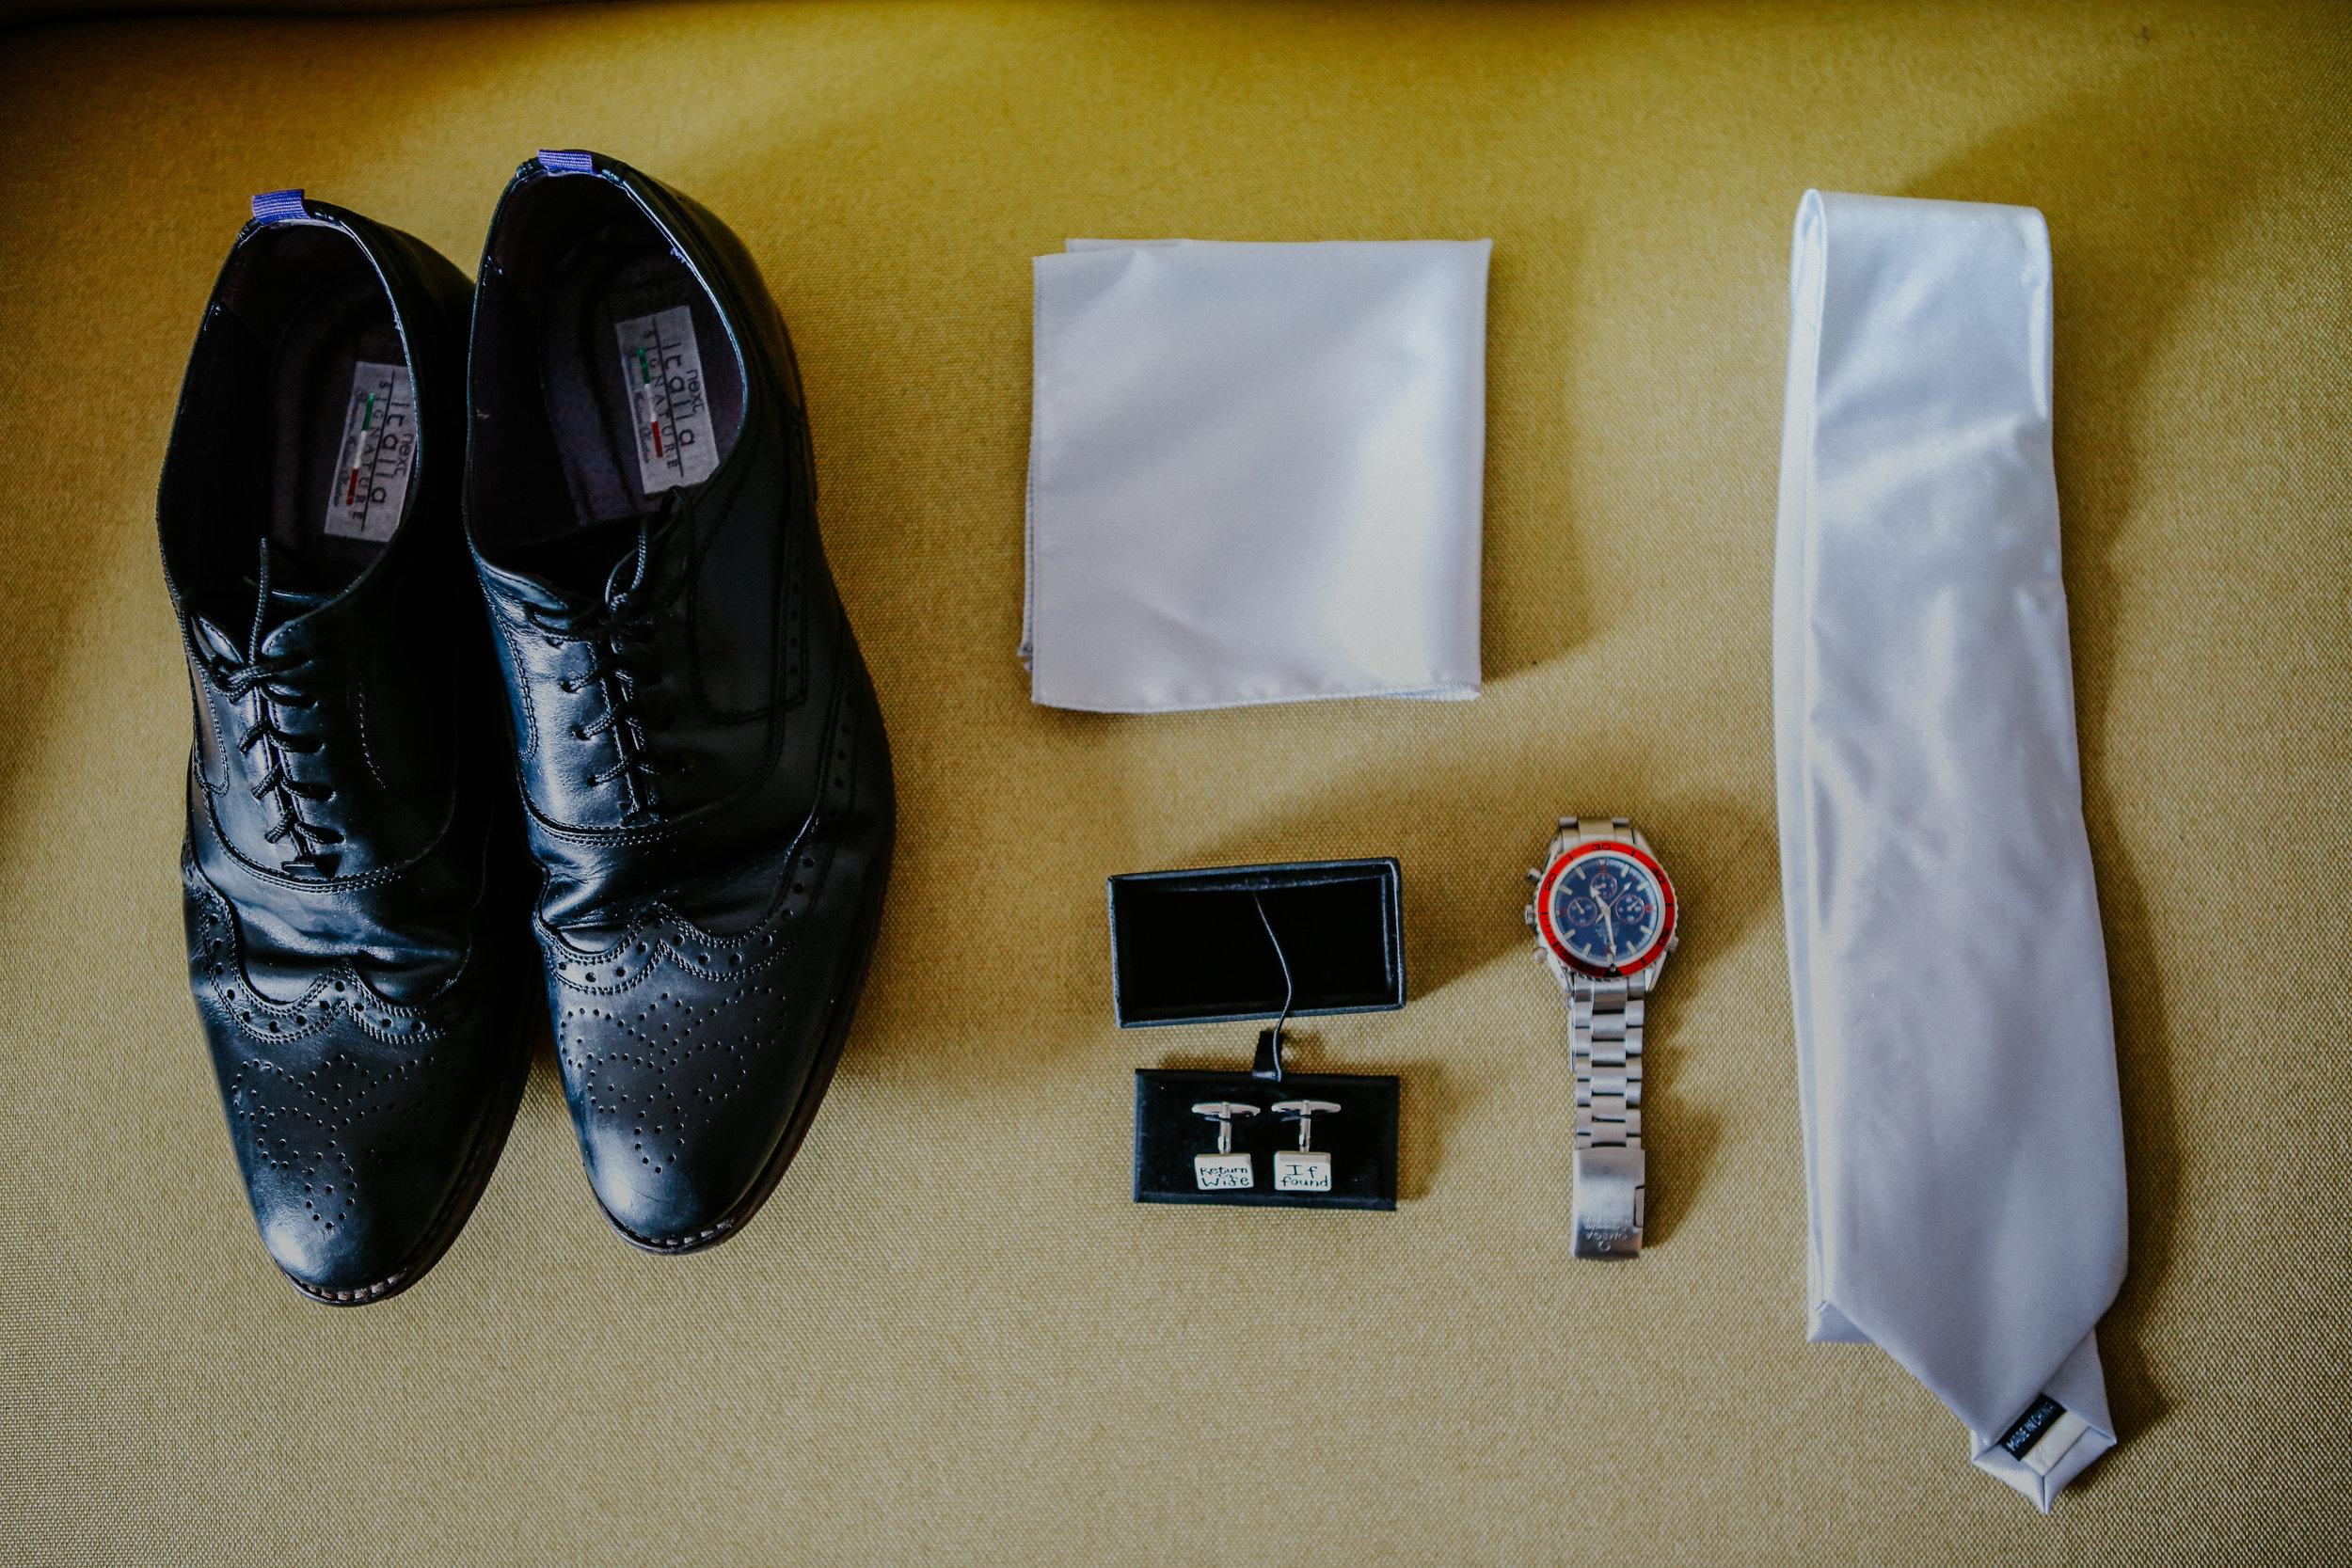 reigate-surrey-london-wedding-photography-tie-shoes-groom-04